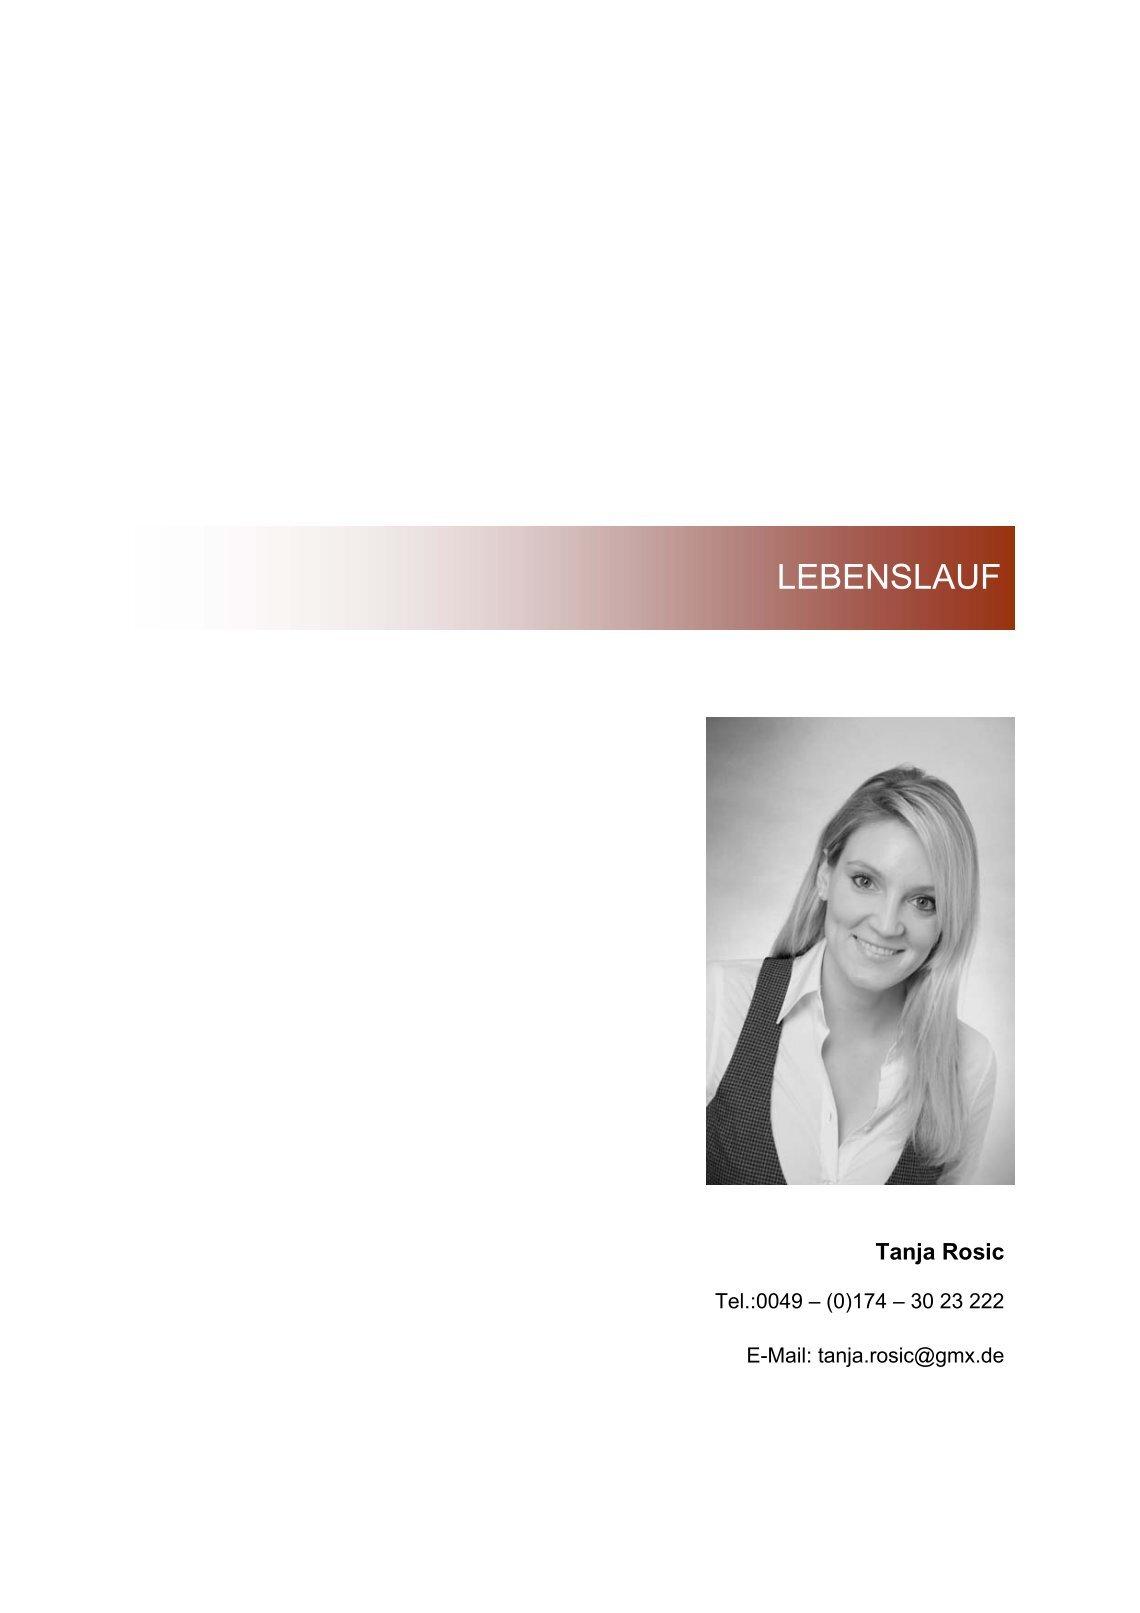 Nett Blue Collar Lebenslauf Ziel Galerie - Entry Level Resume ...